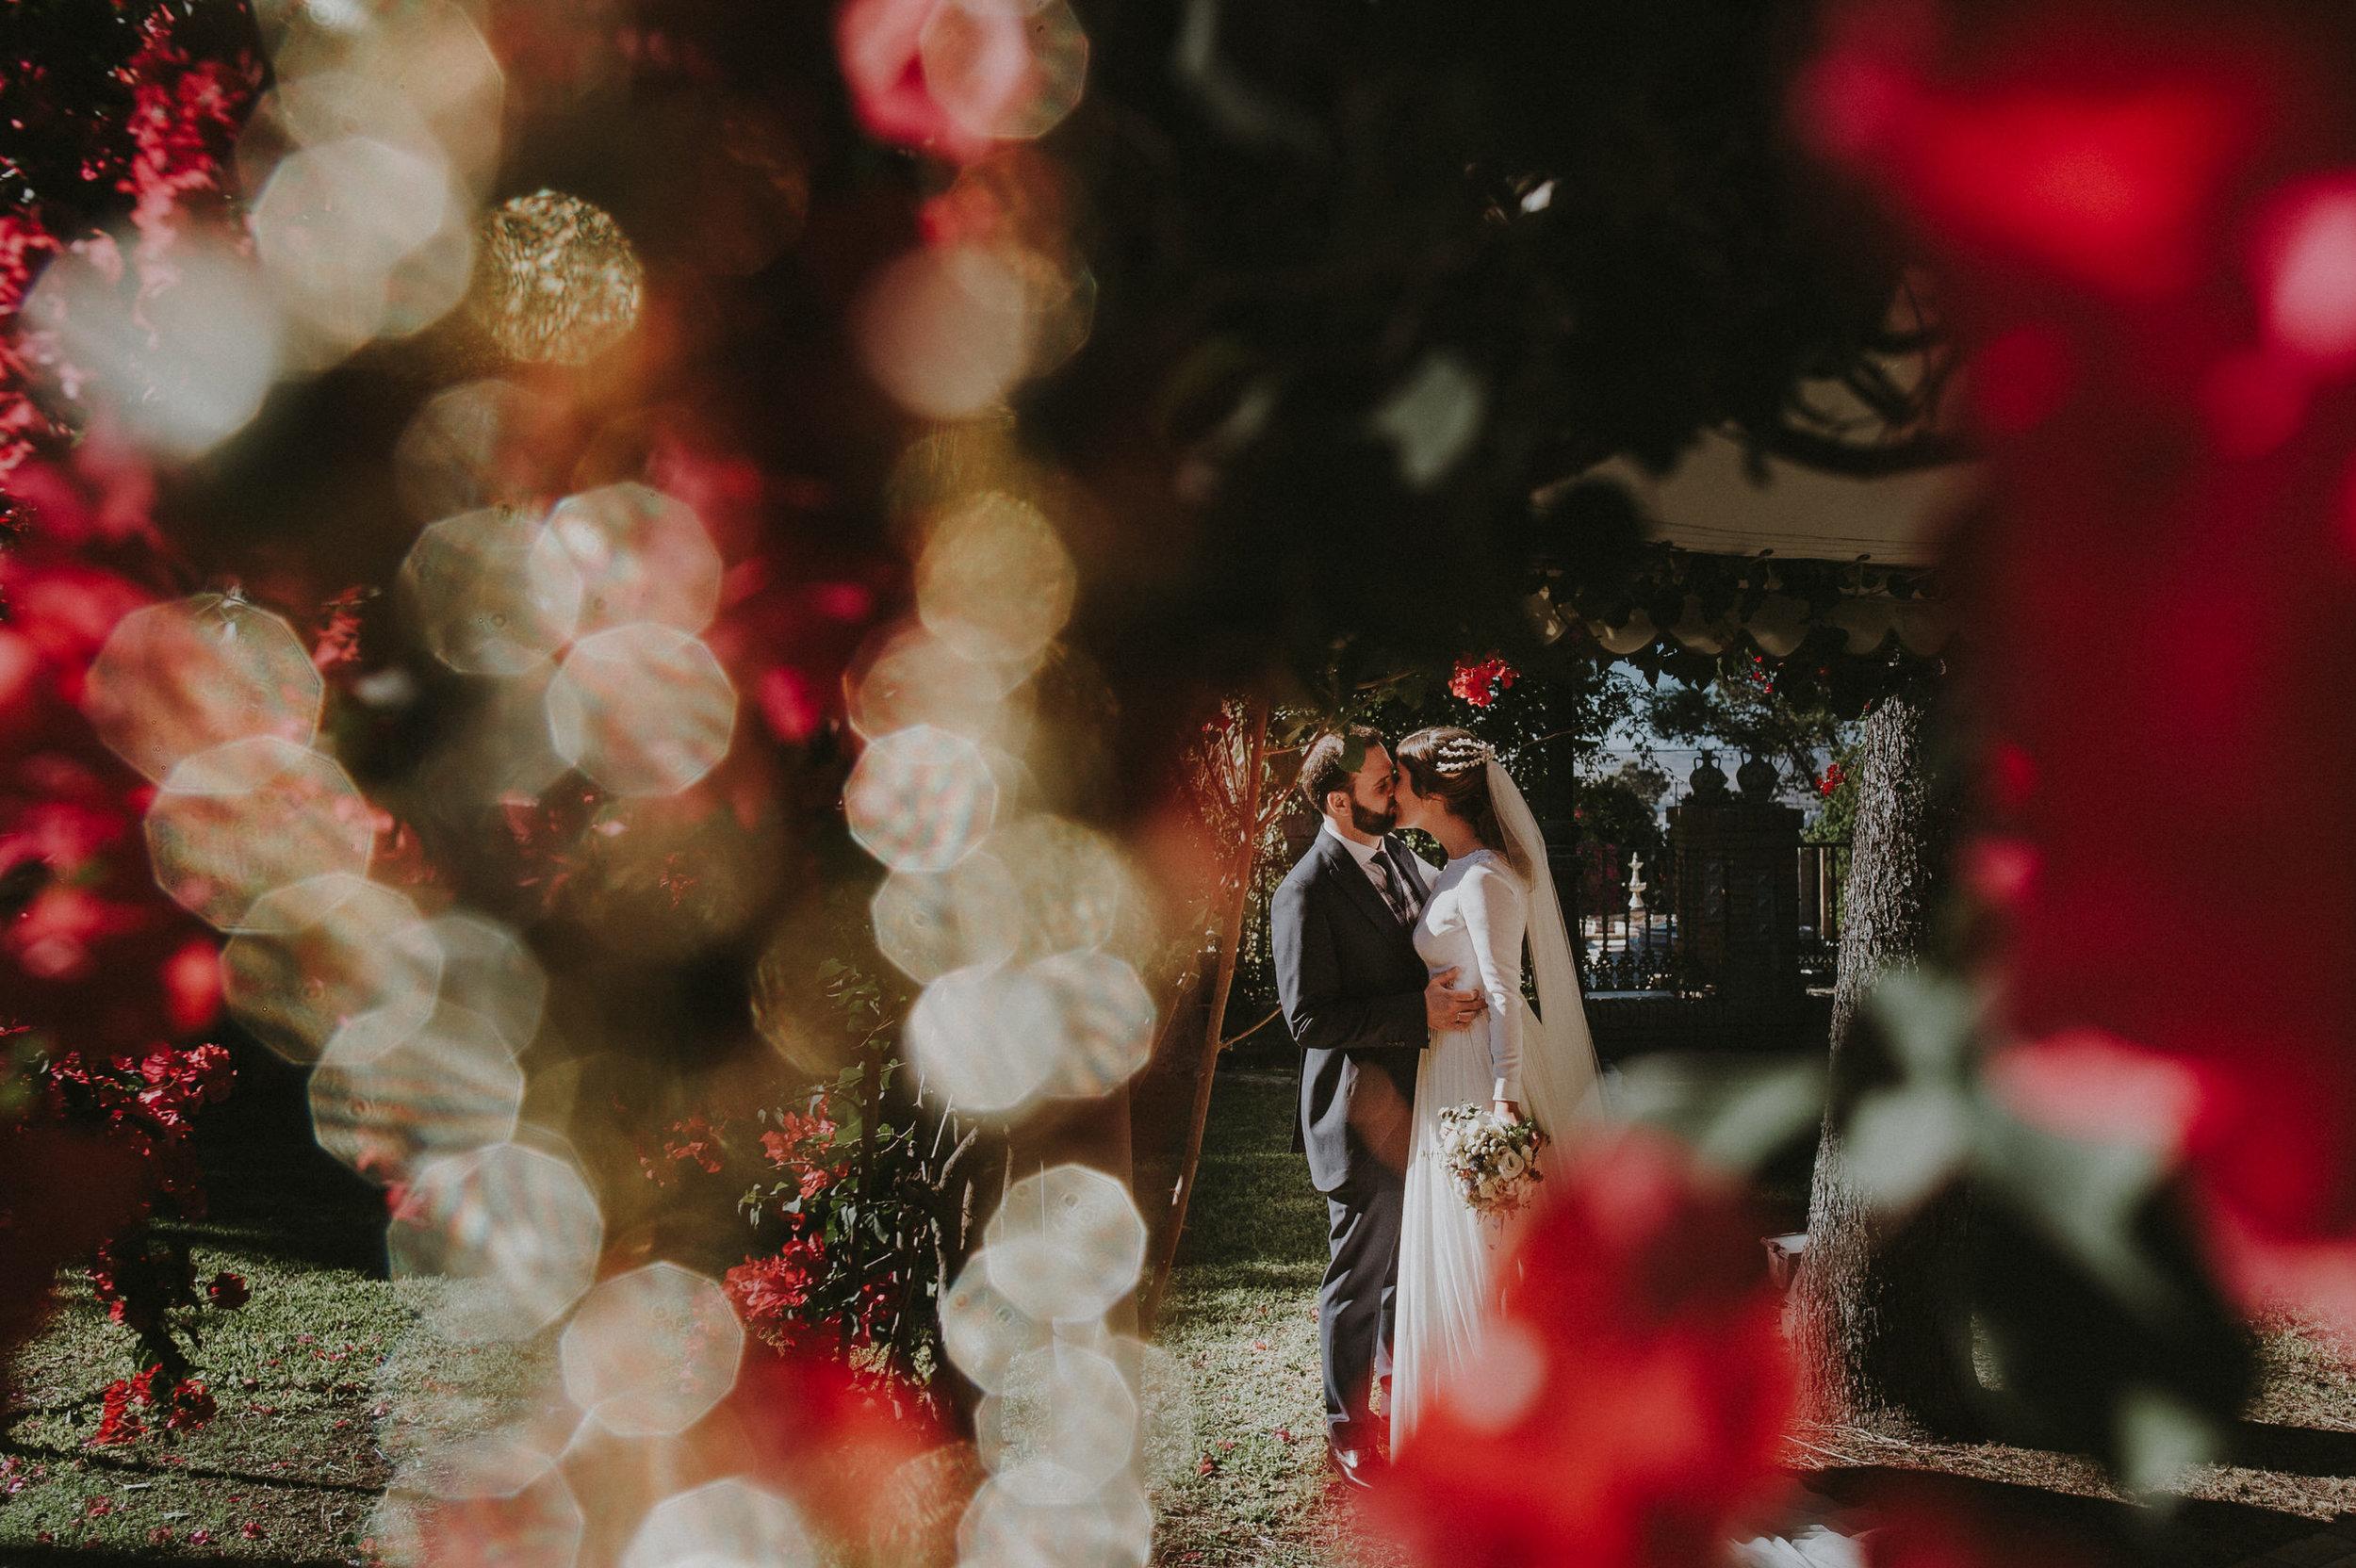 andres+amarillo+fotografo+boda+sevilla+santa+maria+de+la+blanca+al+yamanah (9).JPG